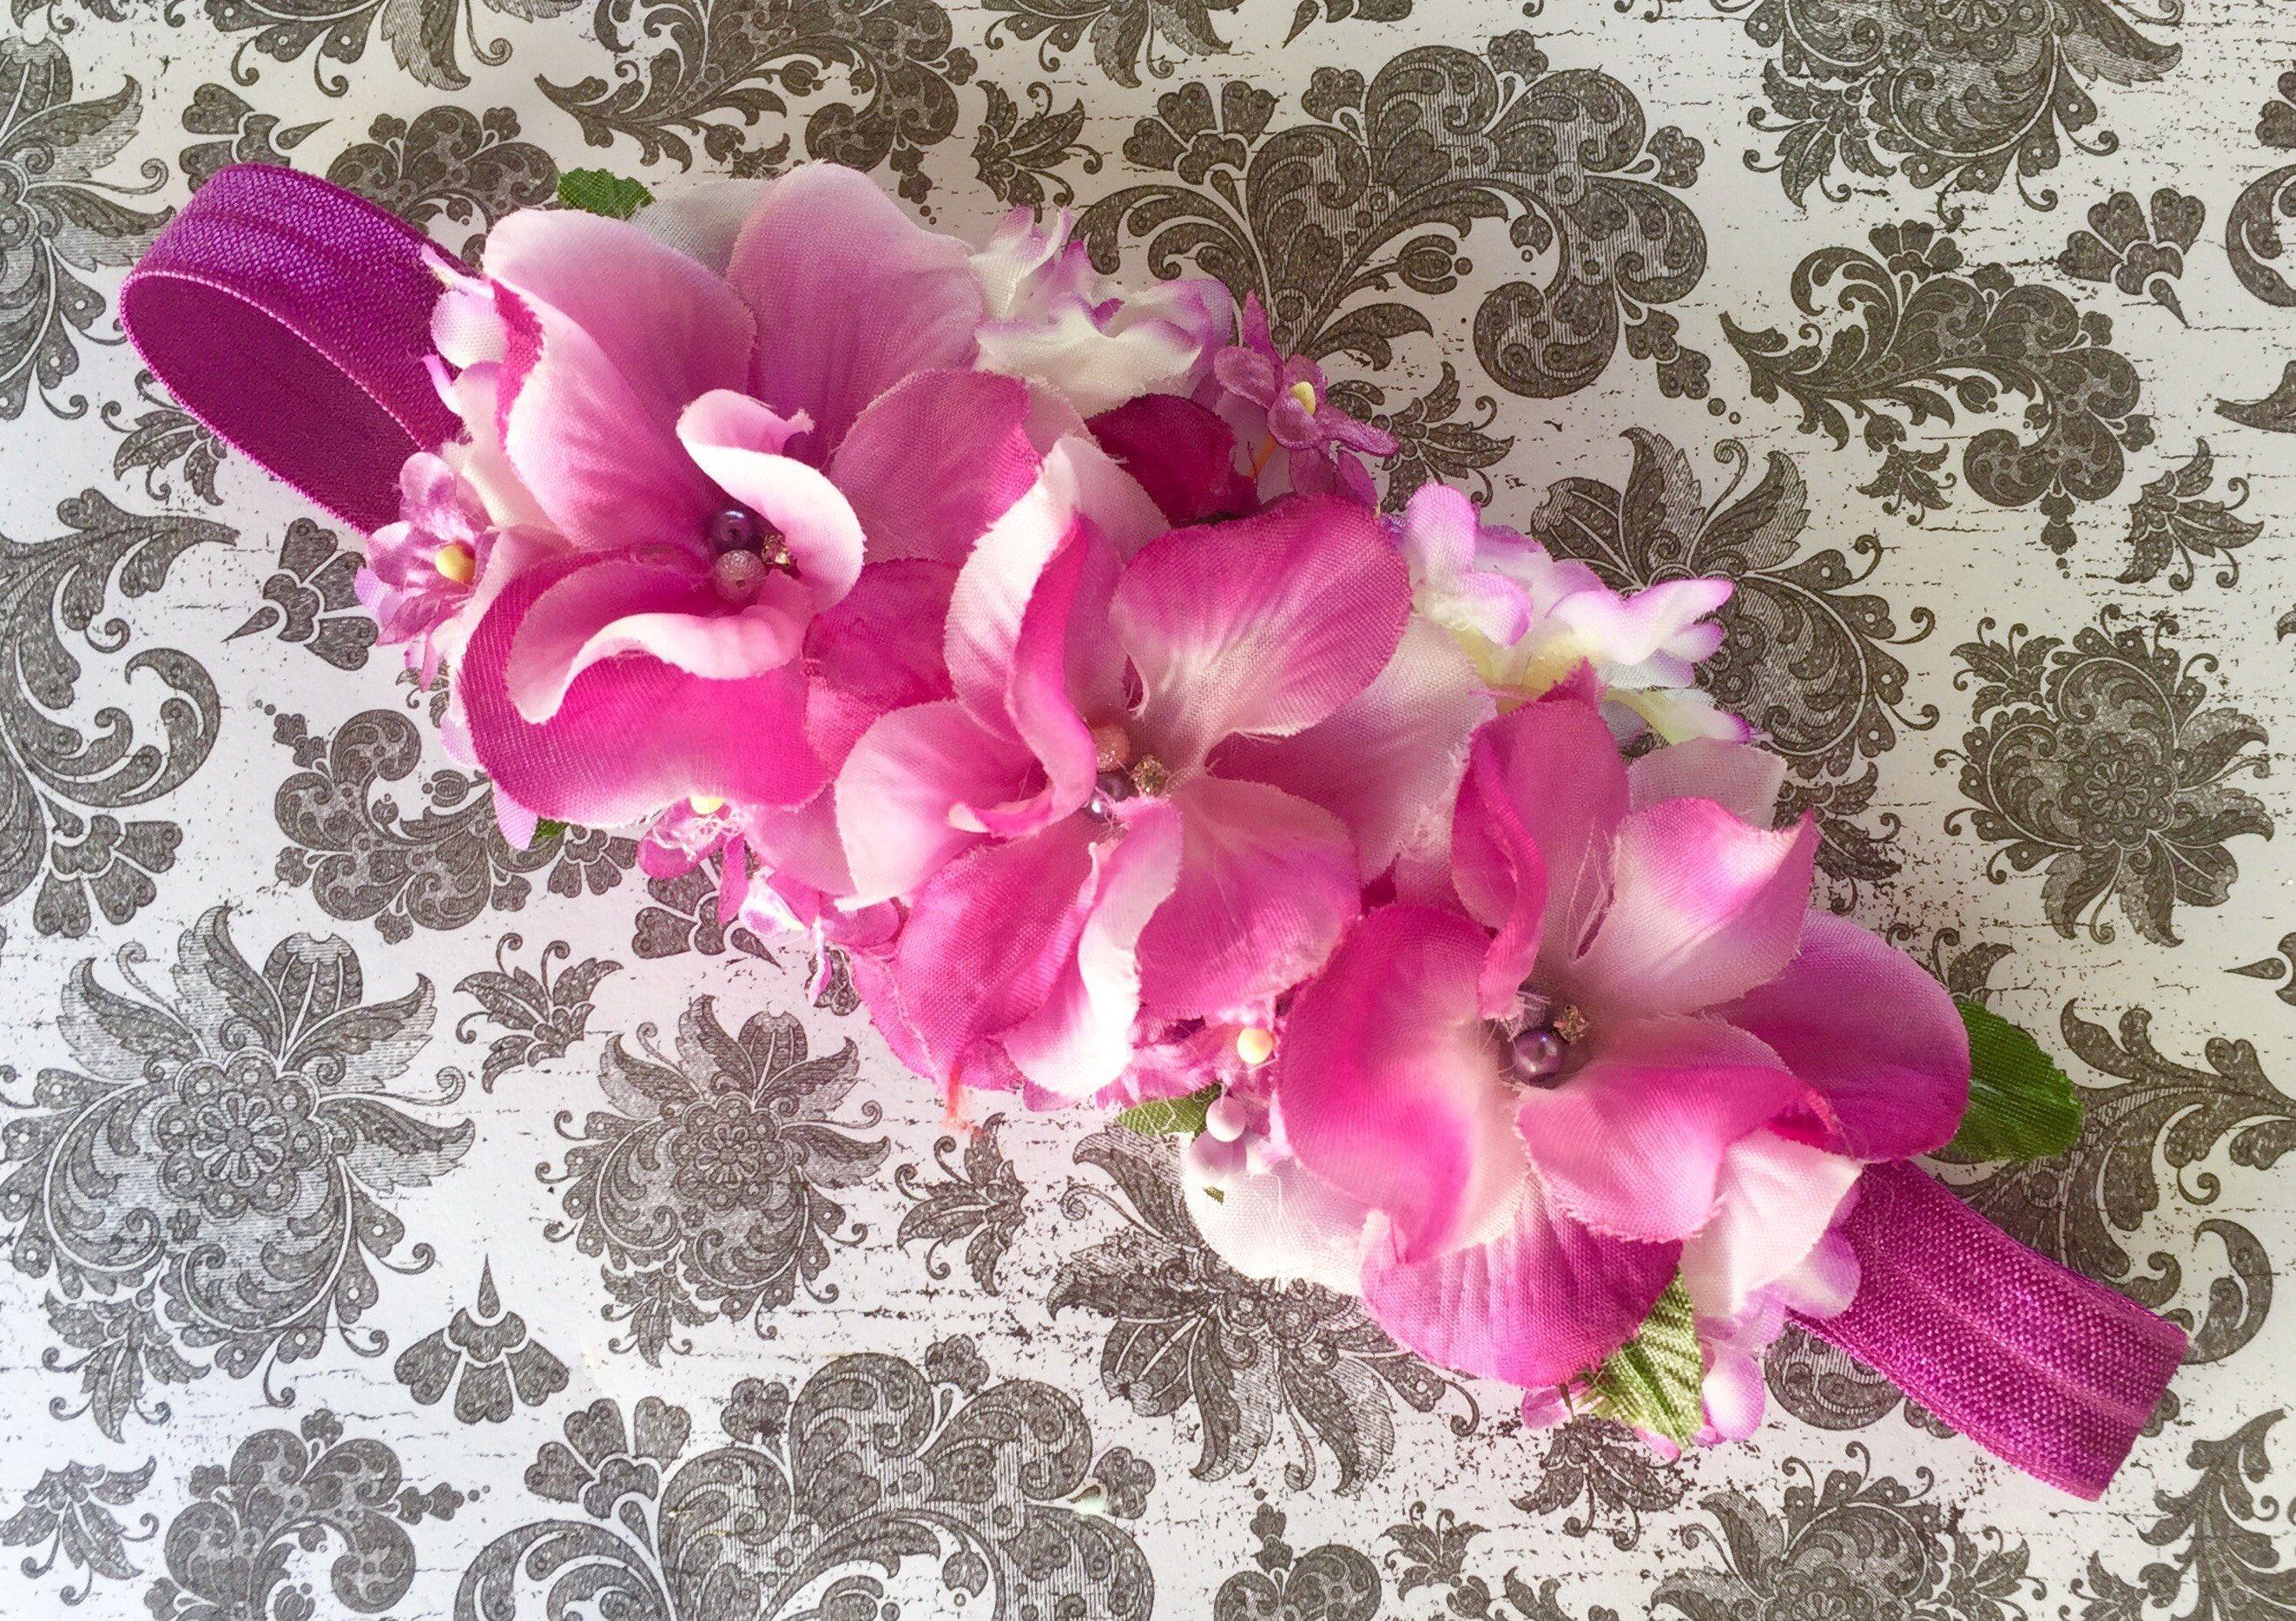 Lavender Plum Pink Lilac And White Newborn Floral Hydrangea